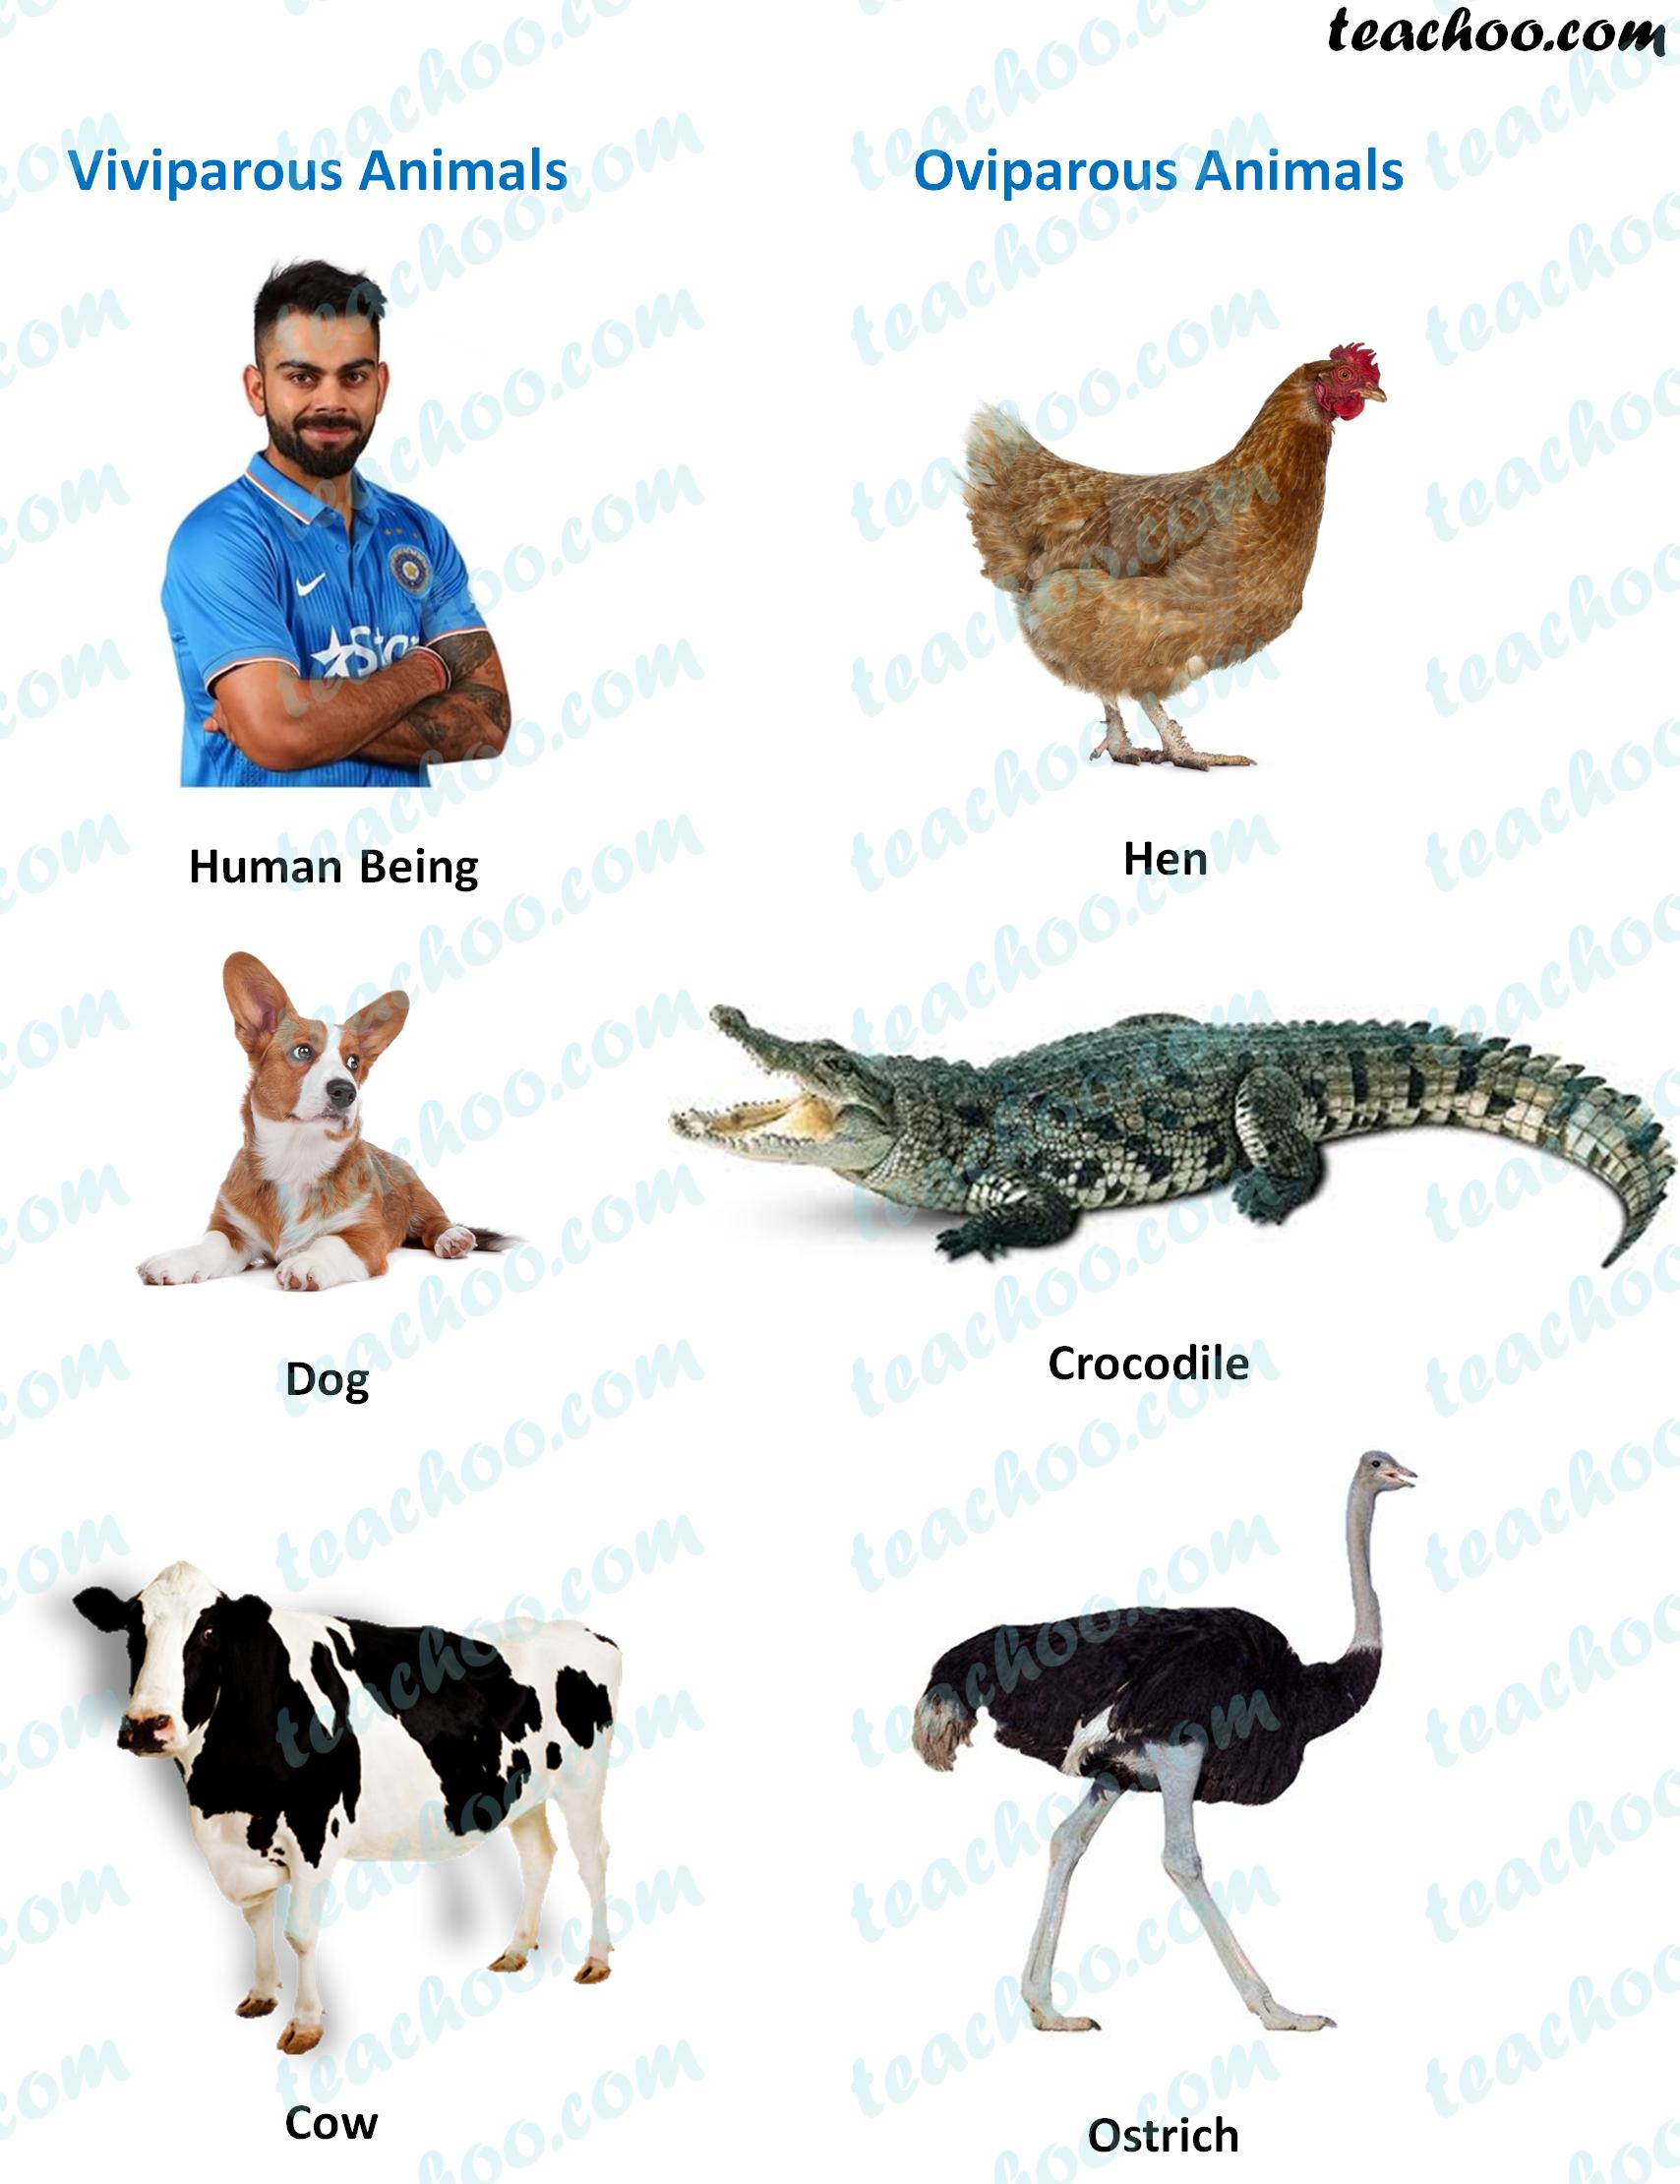 viviparous-animals-oviparous-animals--teachoo.png